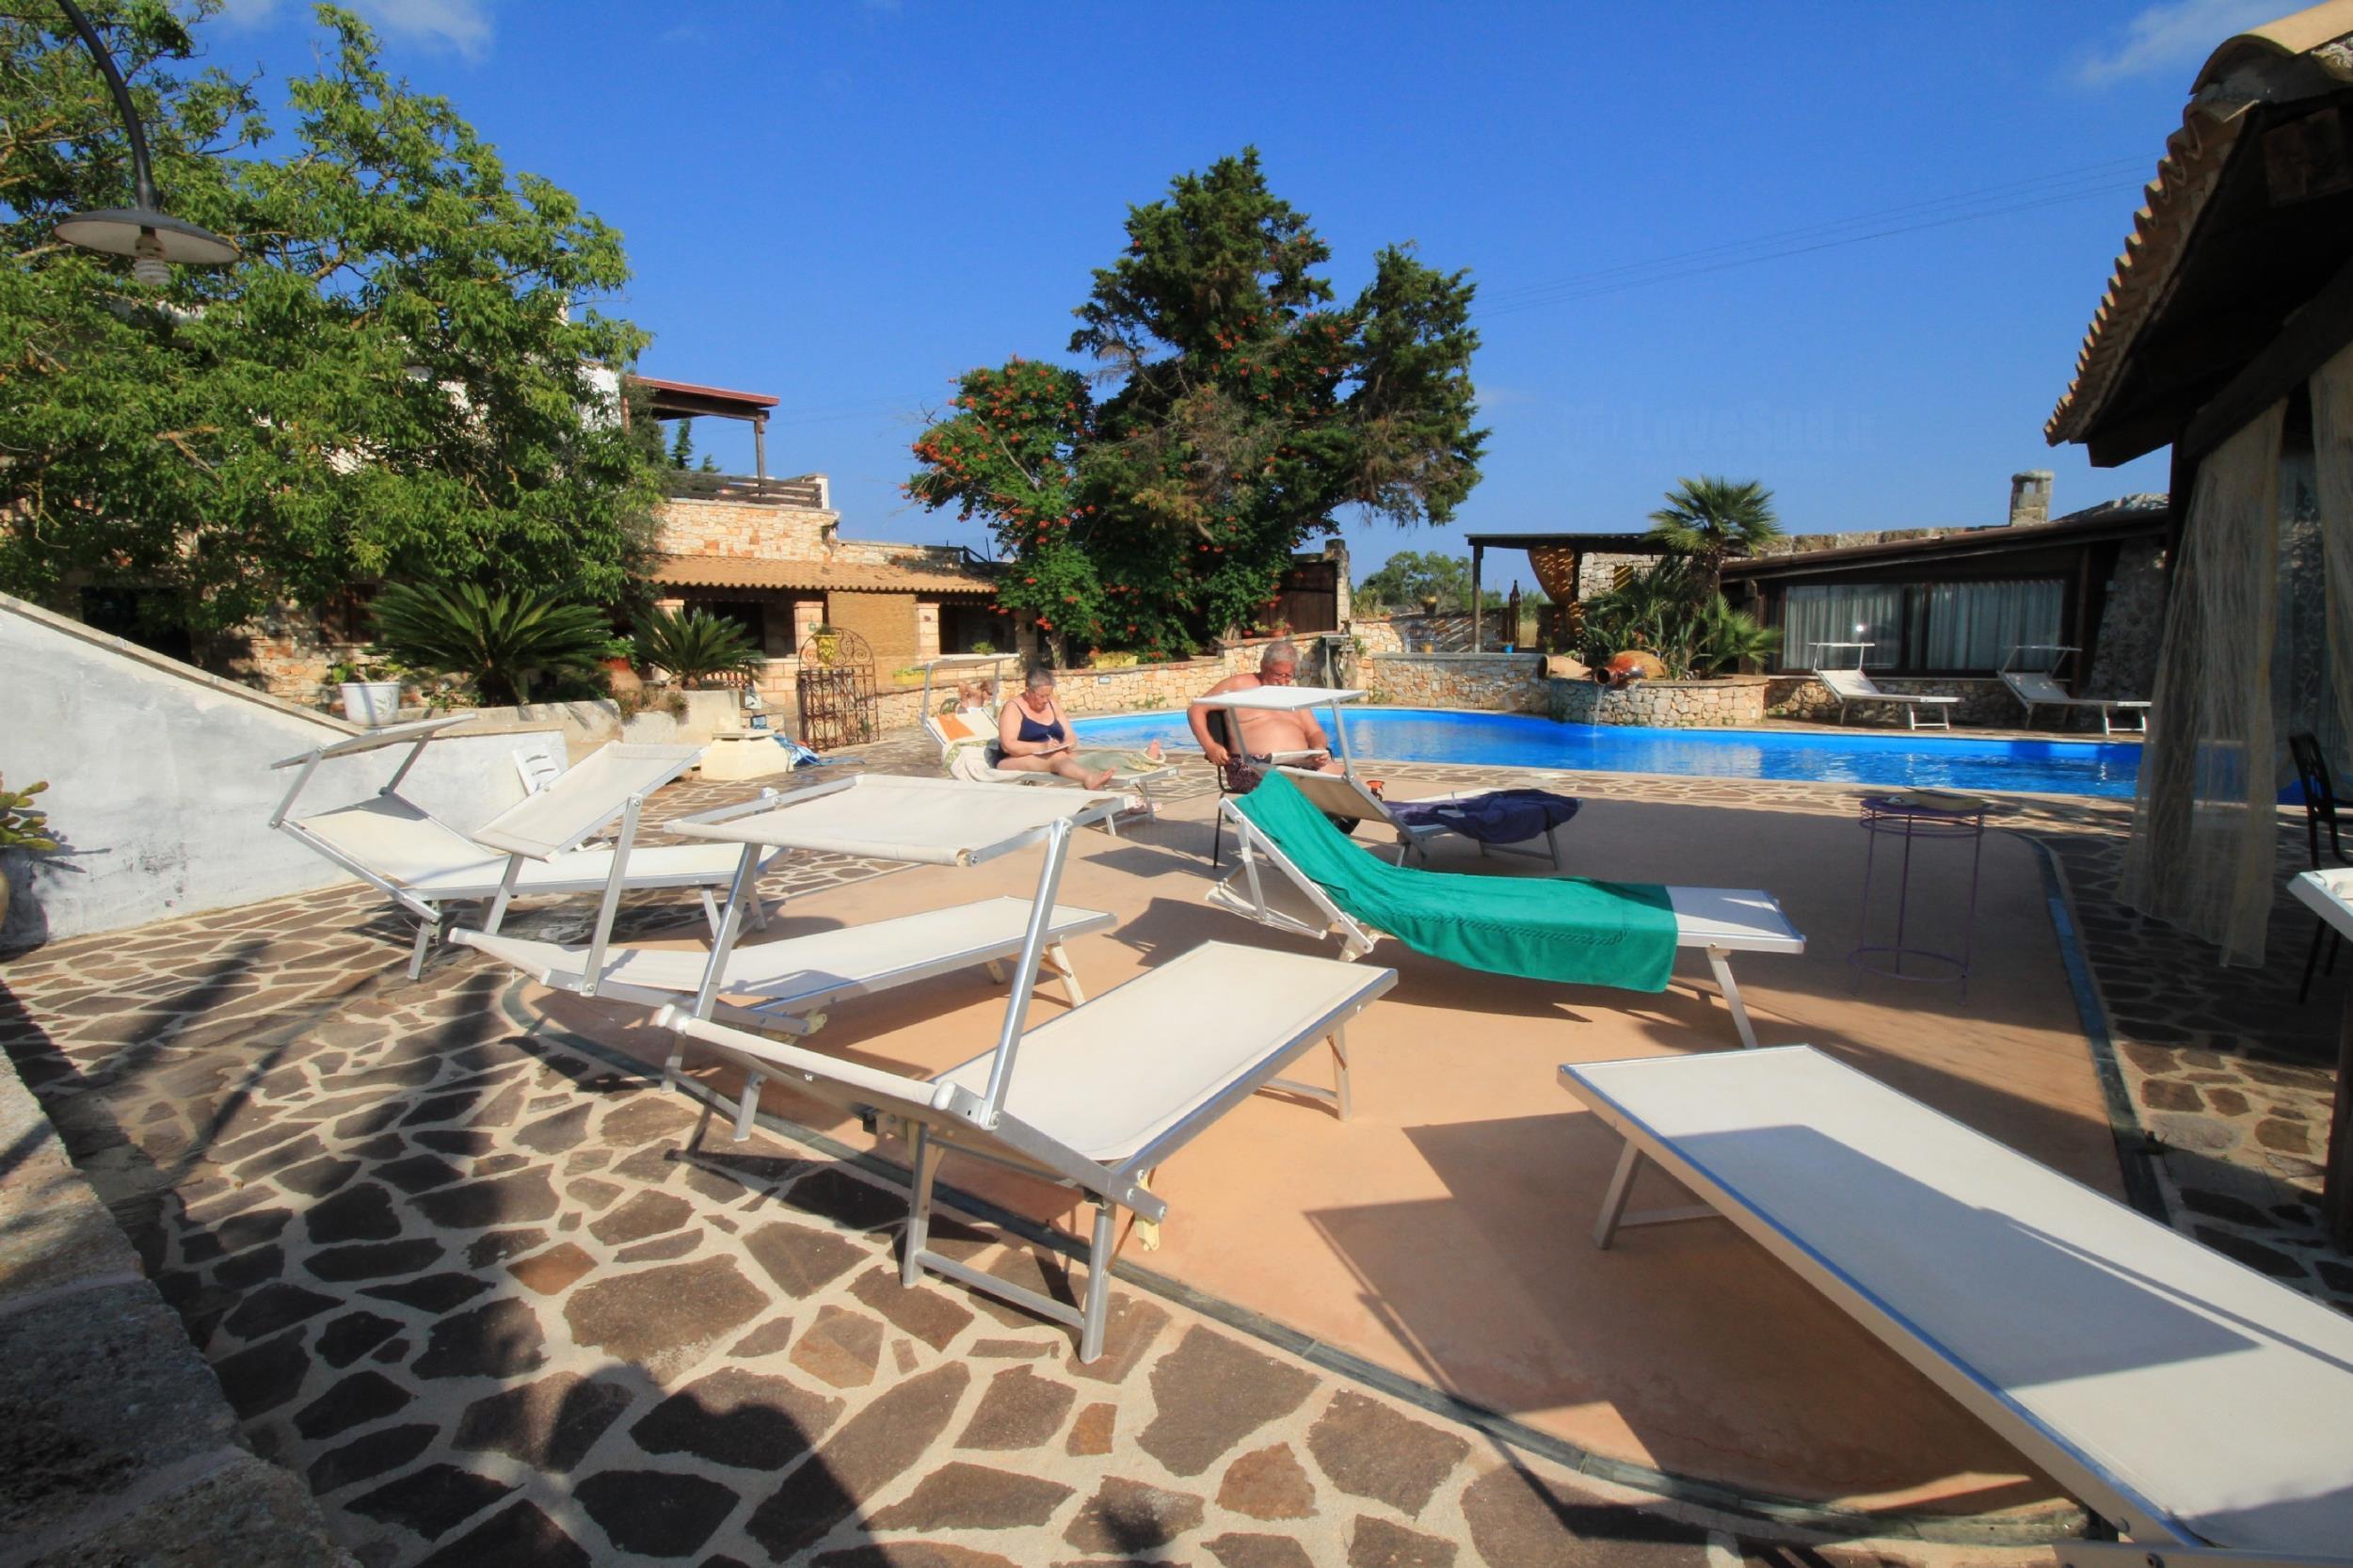 Apartment Taverna piscina e WI FI photo 22471923